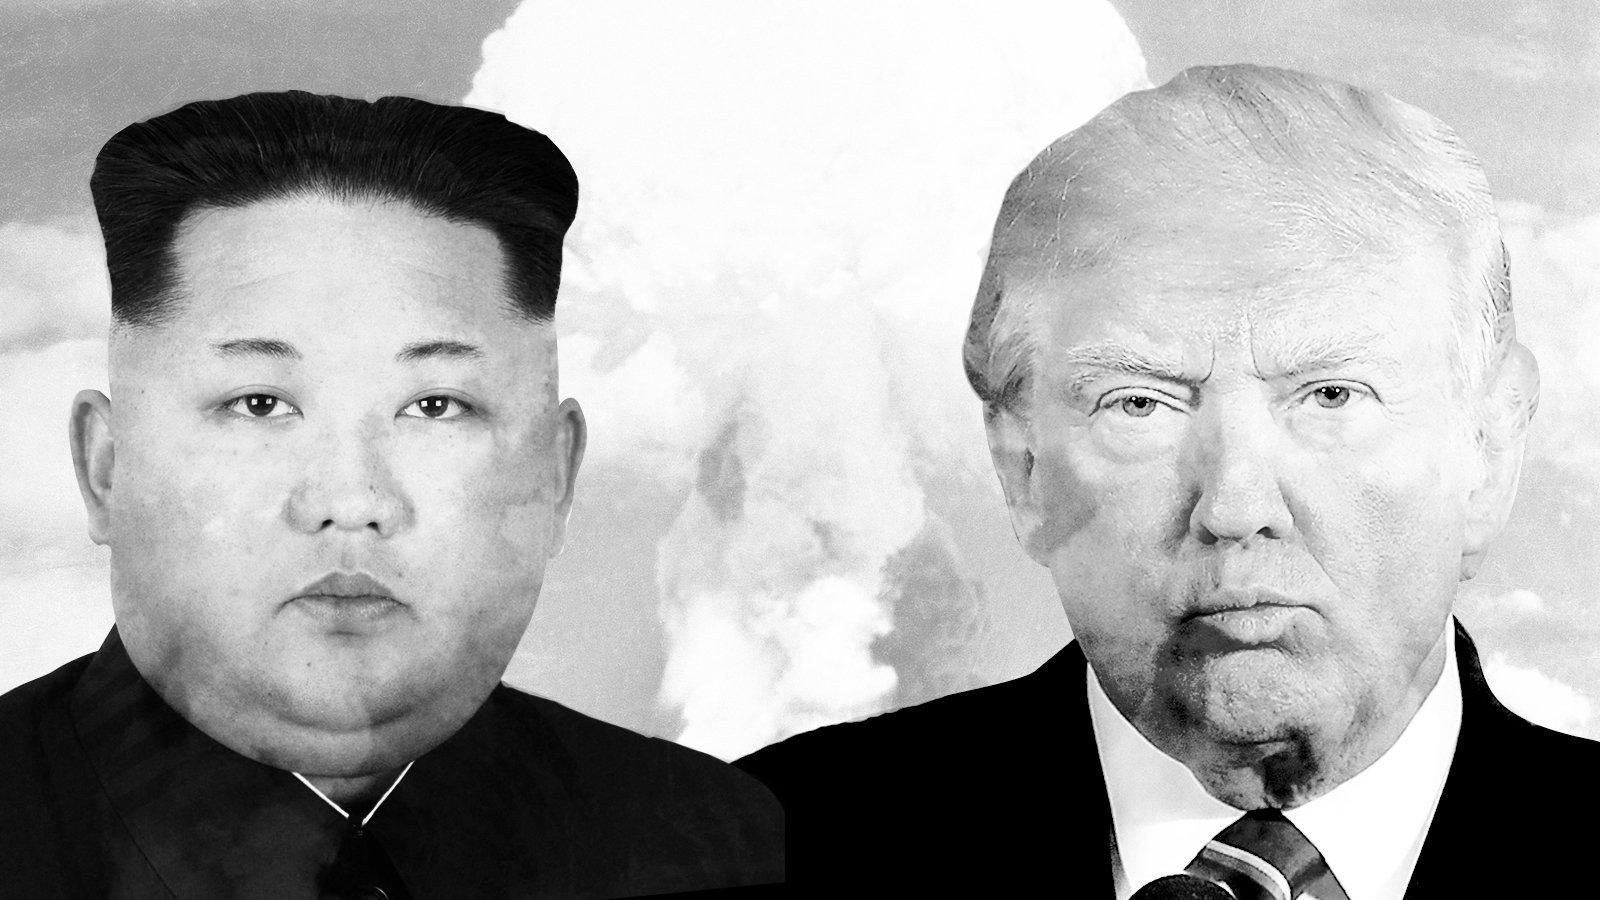 How to win a nuclear standoff: https://t.co/3vh4qJEcxZ https://t.co/jYNfJcIXOF